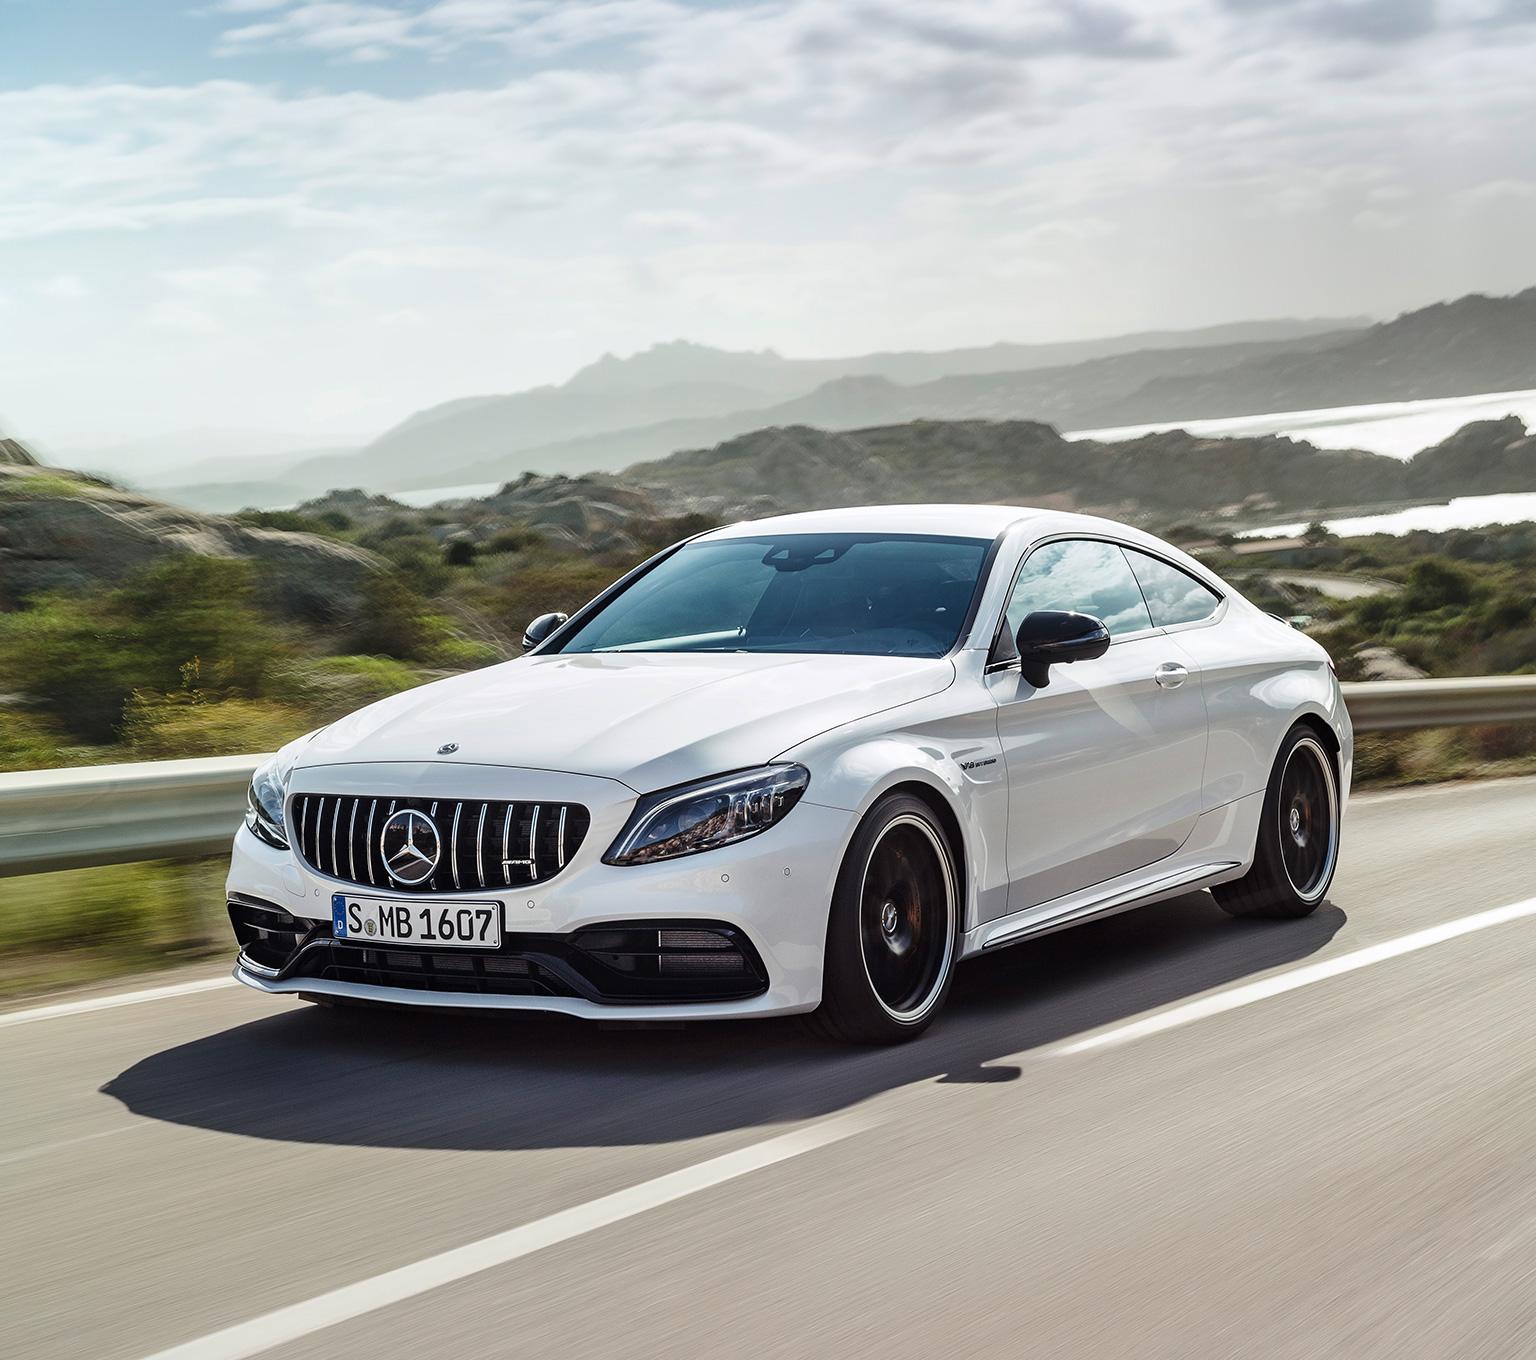 Mercedes Benz Home Of C E S Cls Cl Slk Sl R Glk M